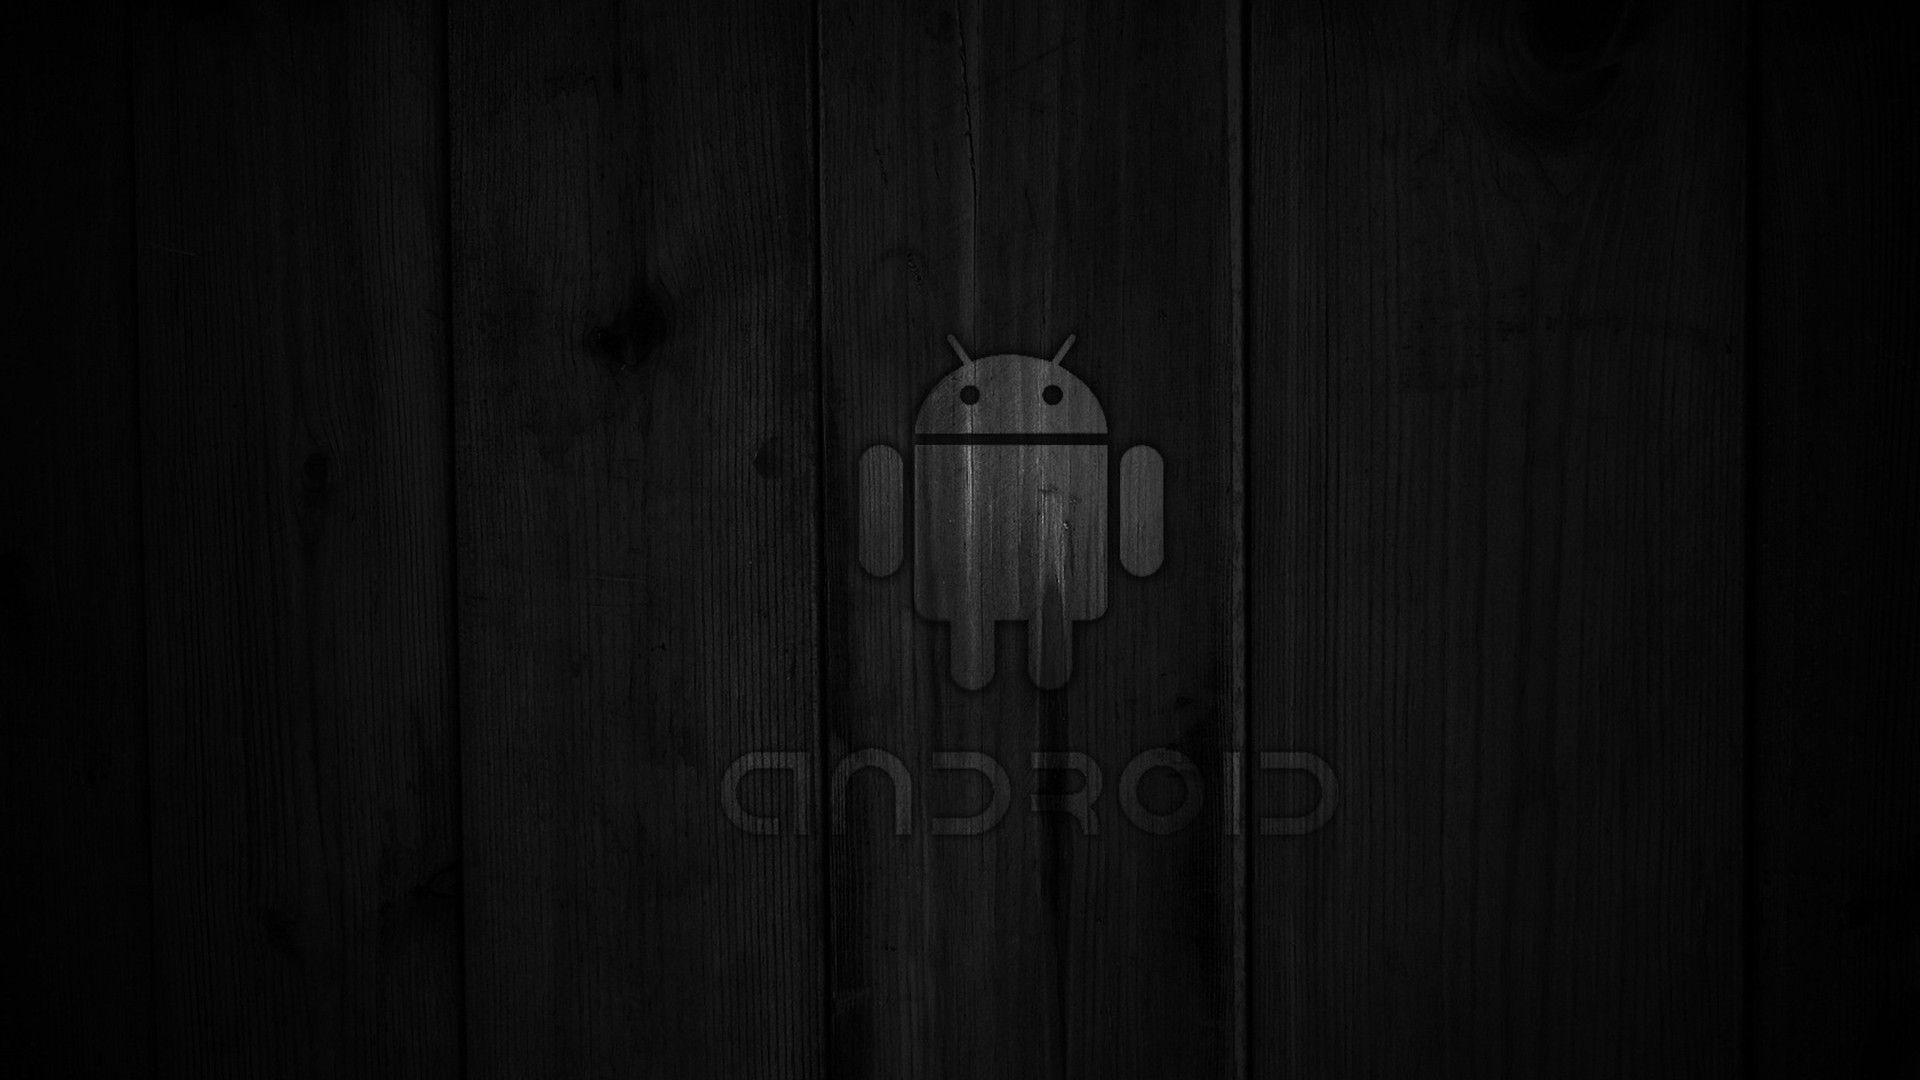 Black Android Logo Wallpaper | Wallpaper Download